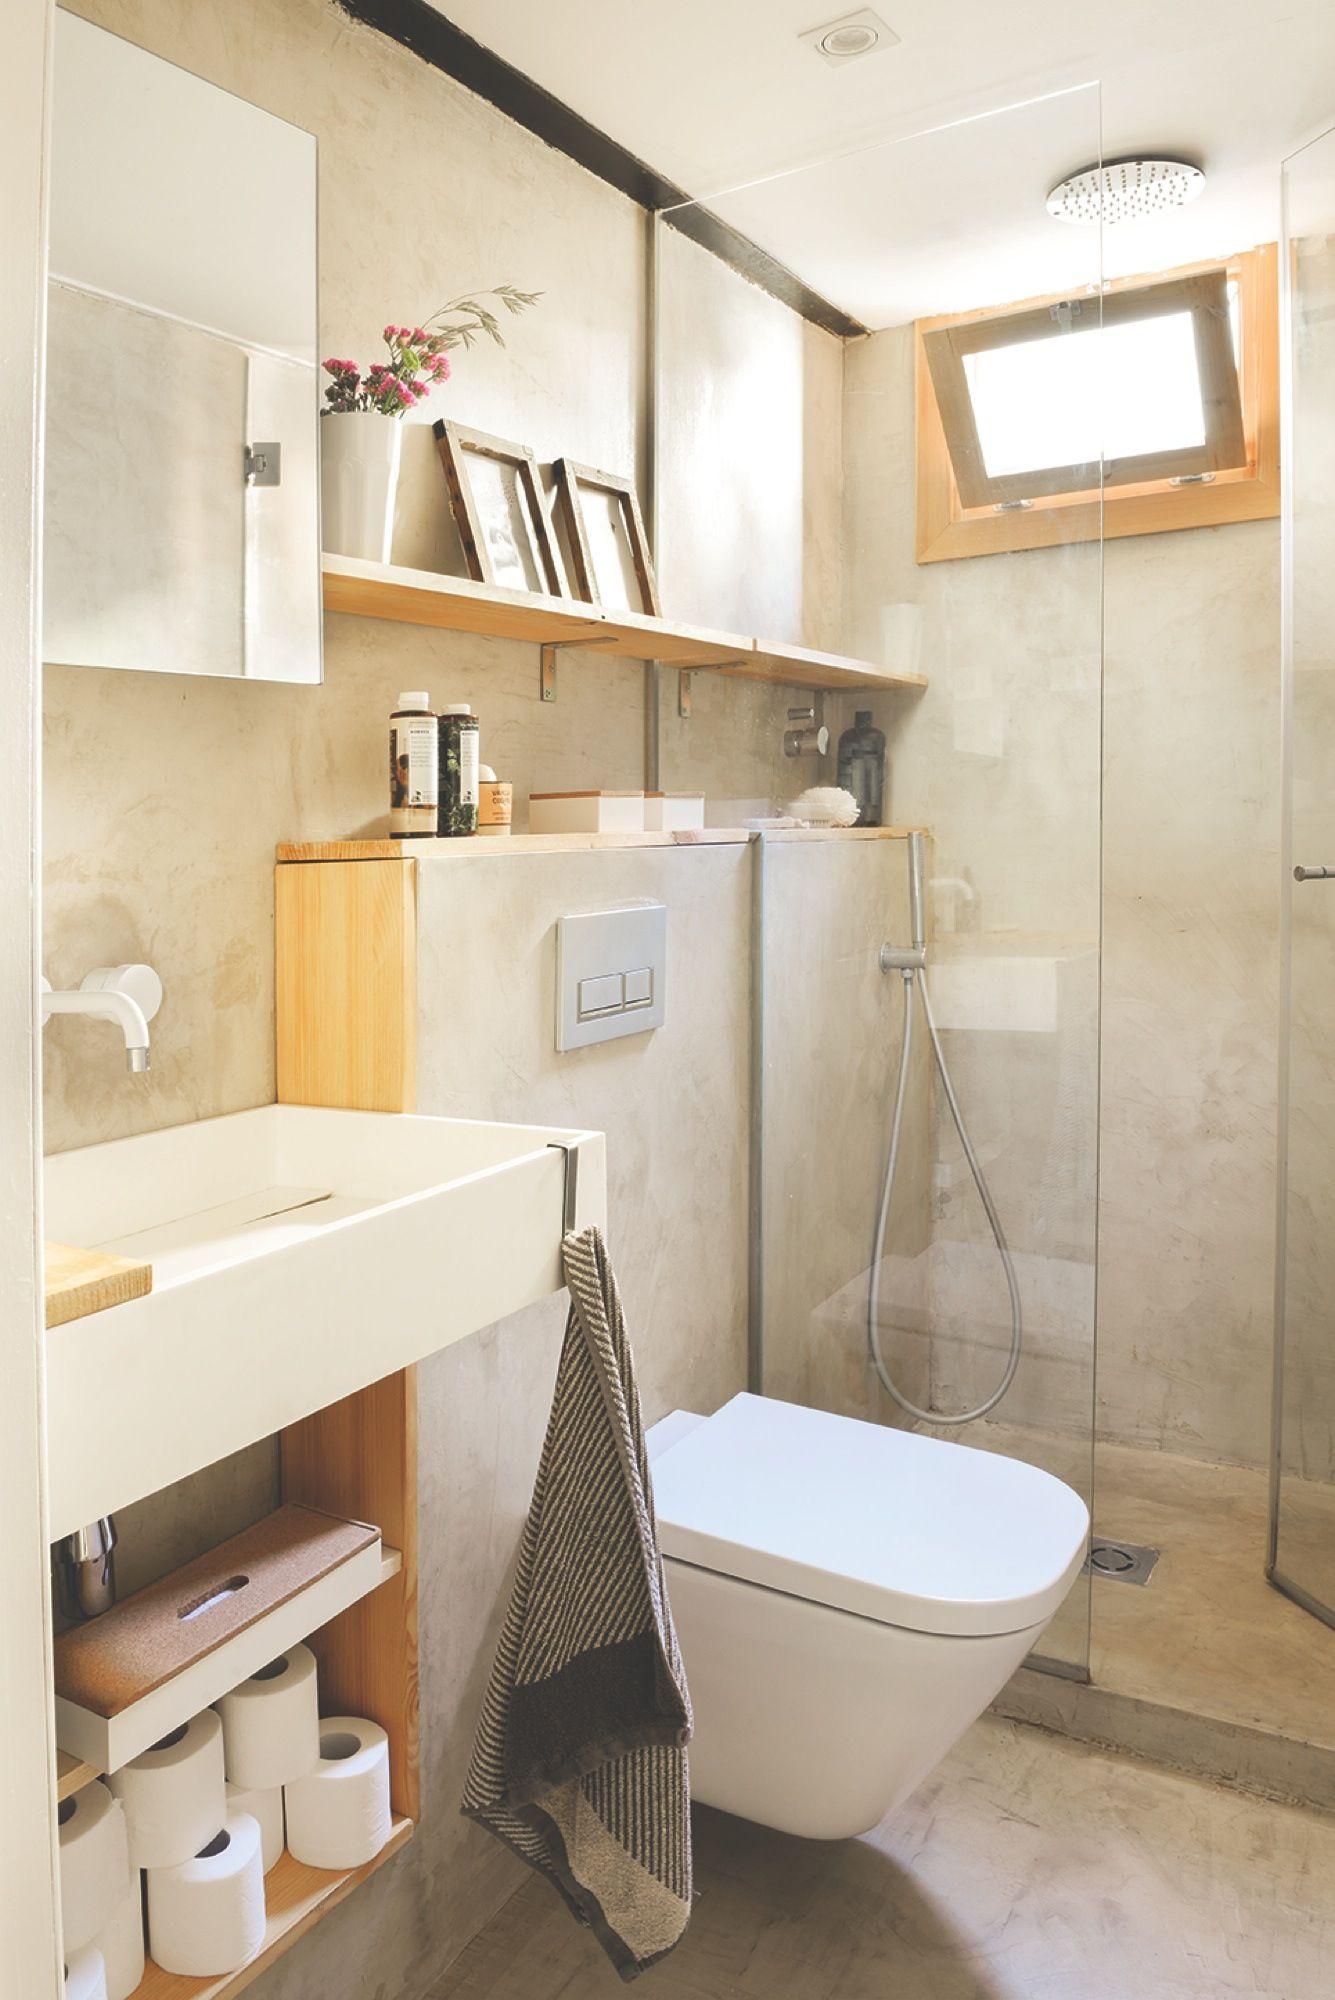 Ba o peque o en microcemento gris y madera piso neus for Decoracion piso jovenes